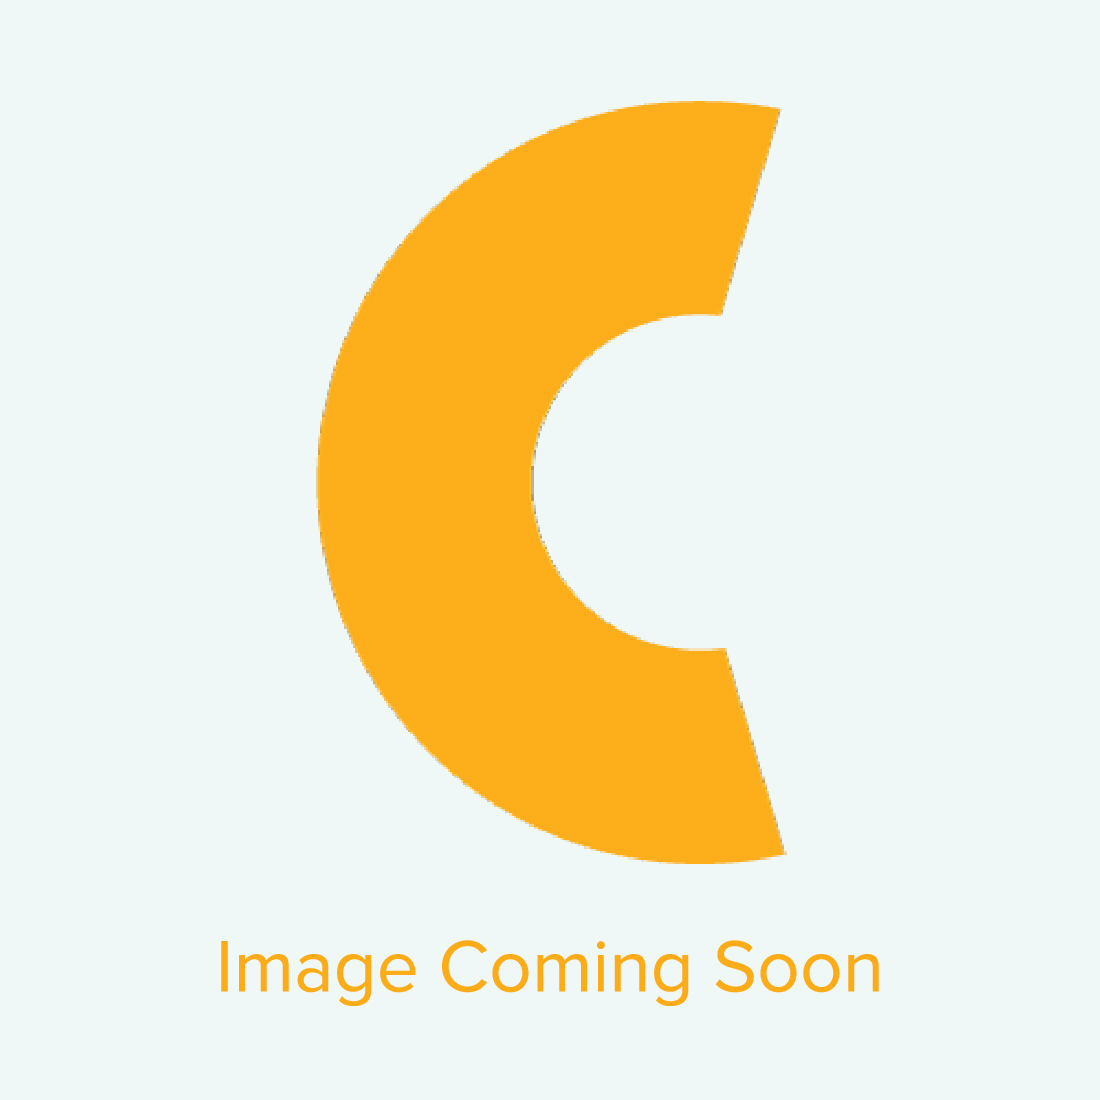 Emboss Texture Custom Report Covers (100pcs)